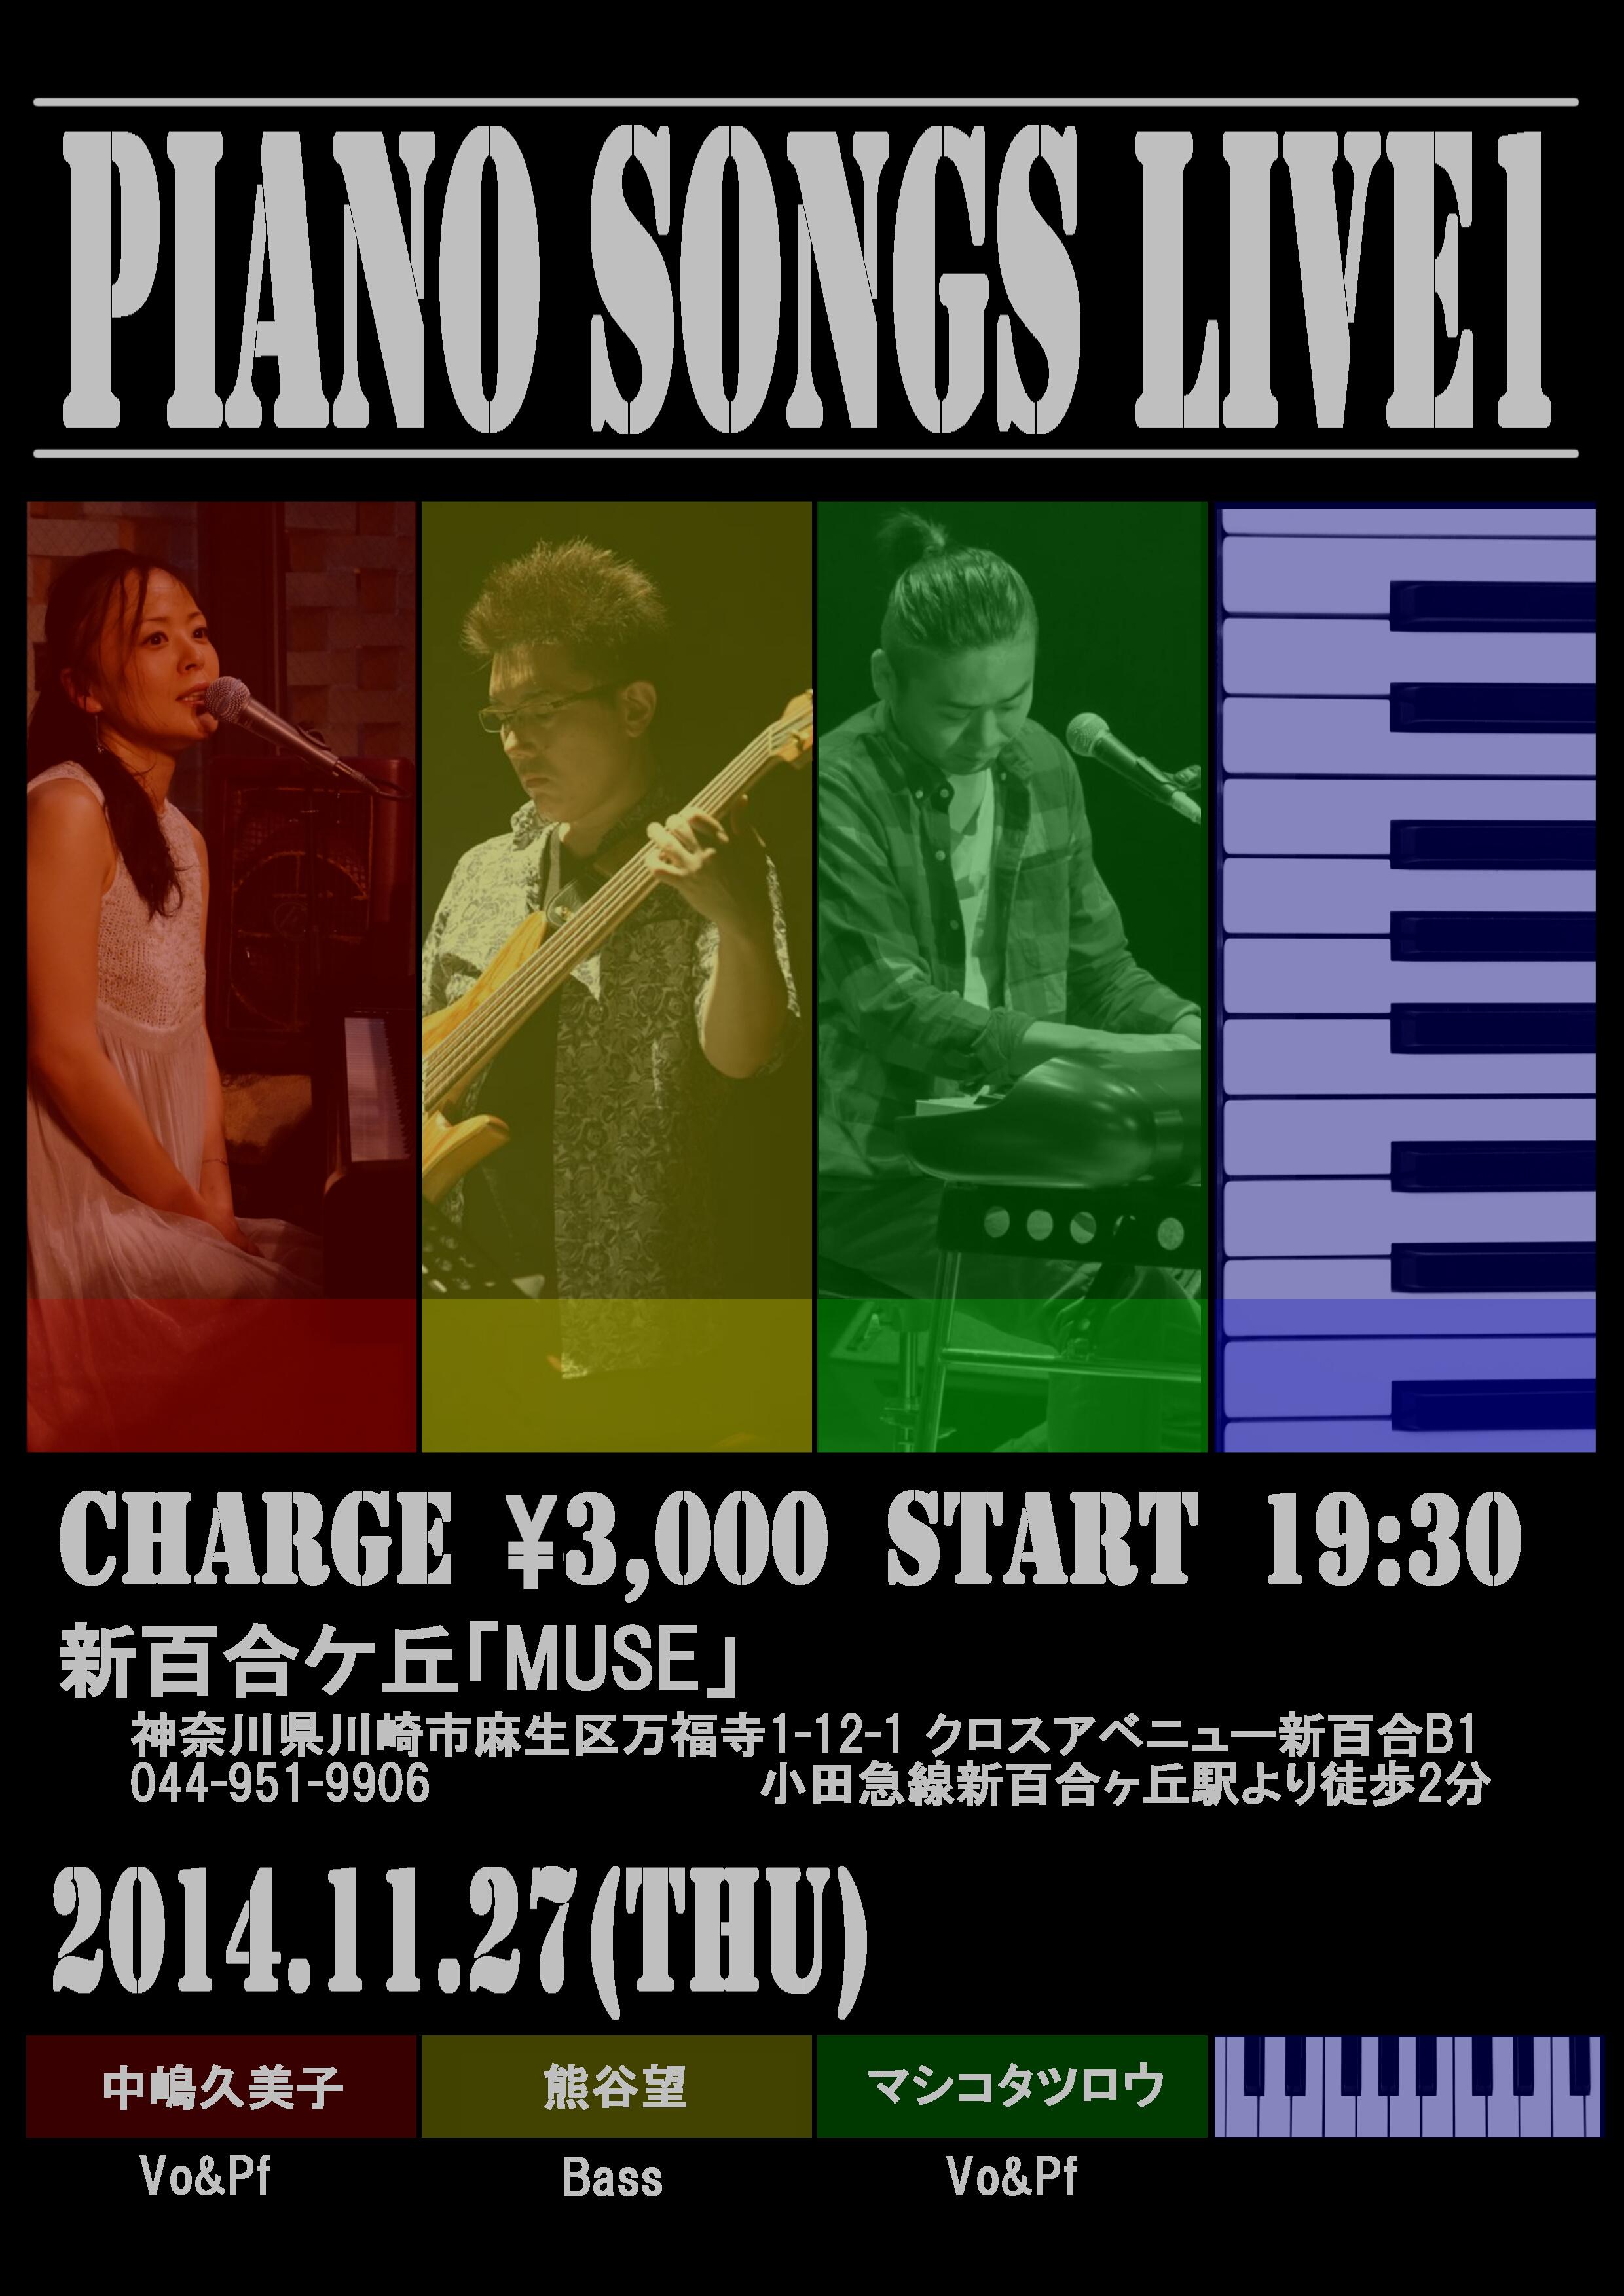 2014.11.27thu LIVE info